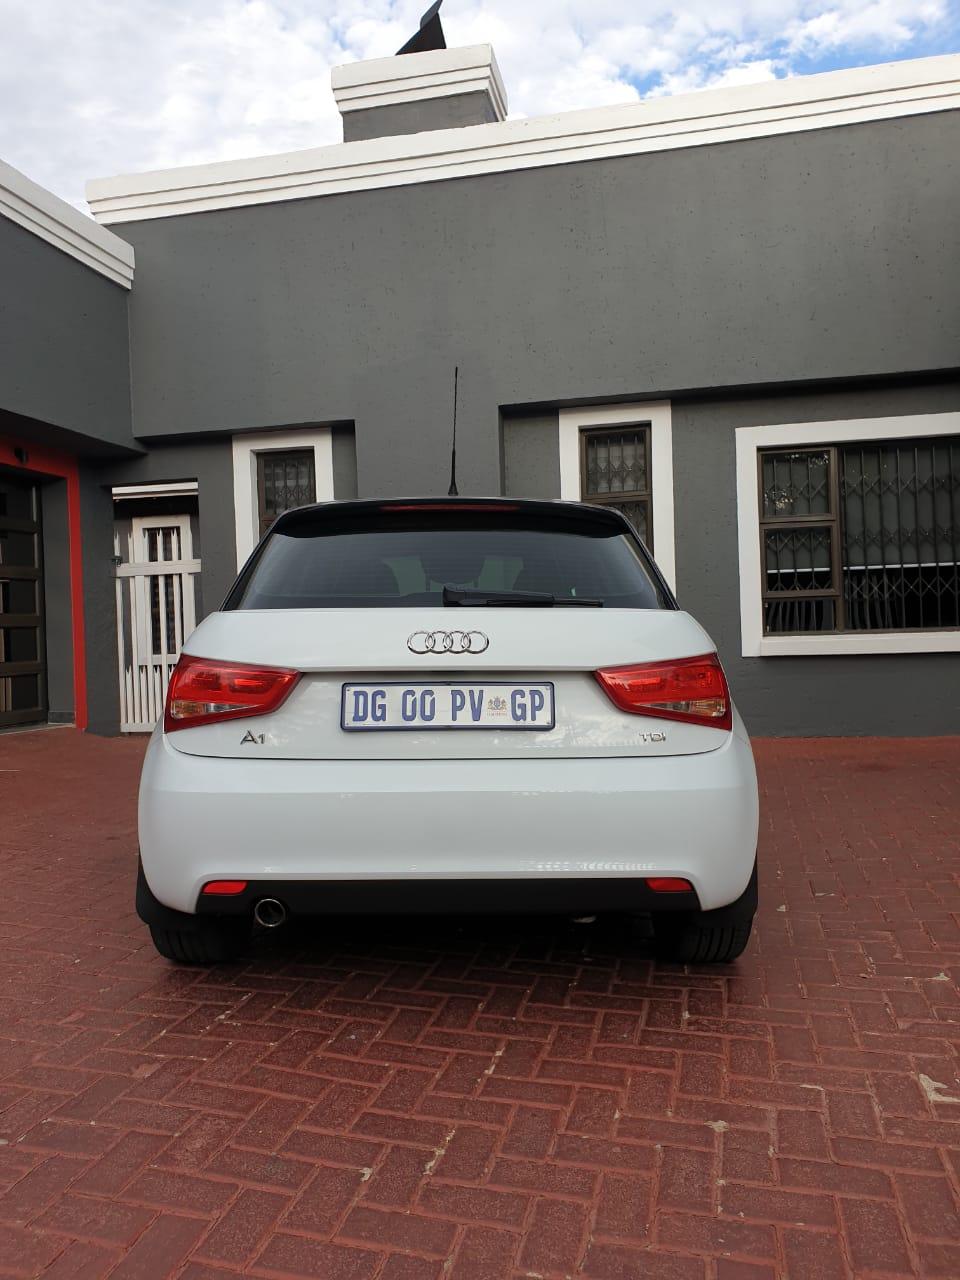 2014 Audi A1 1.6TDI Ambition